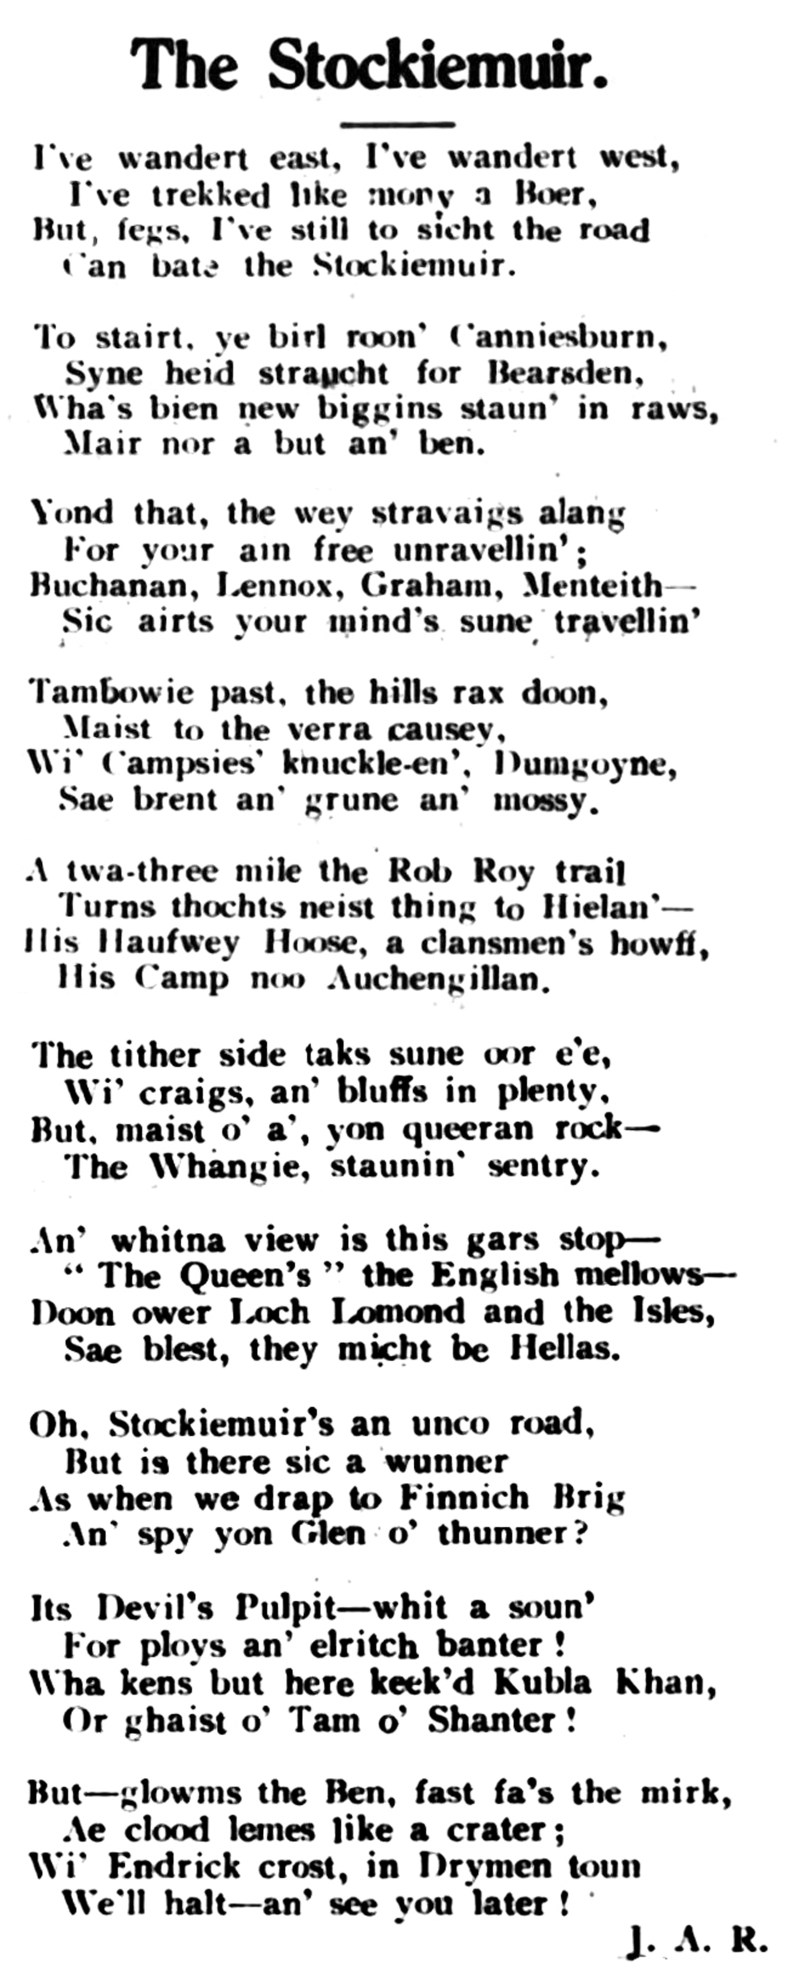 Poem - The Stockiemuir - 1938